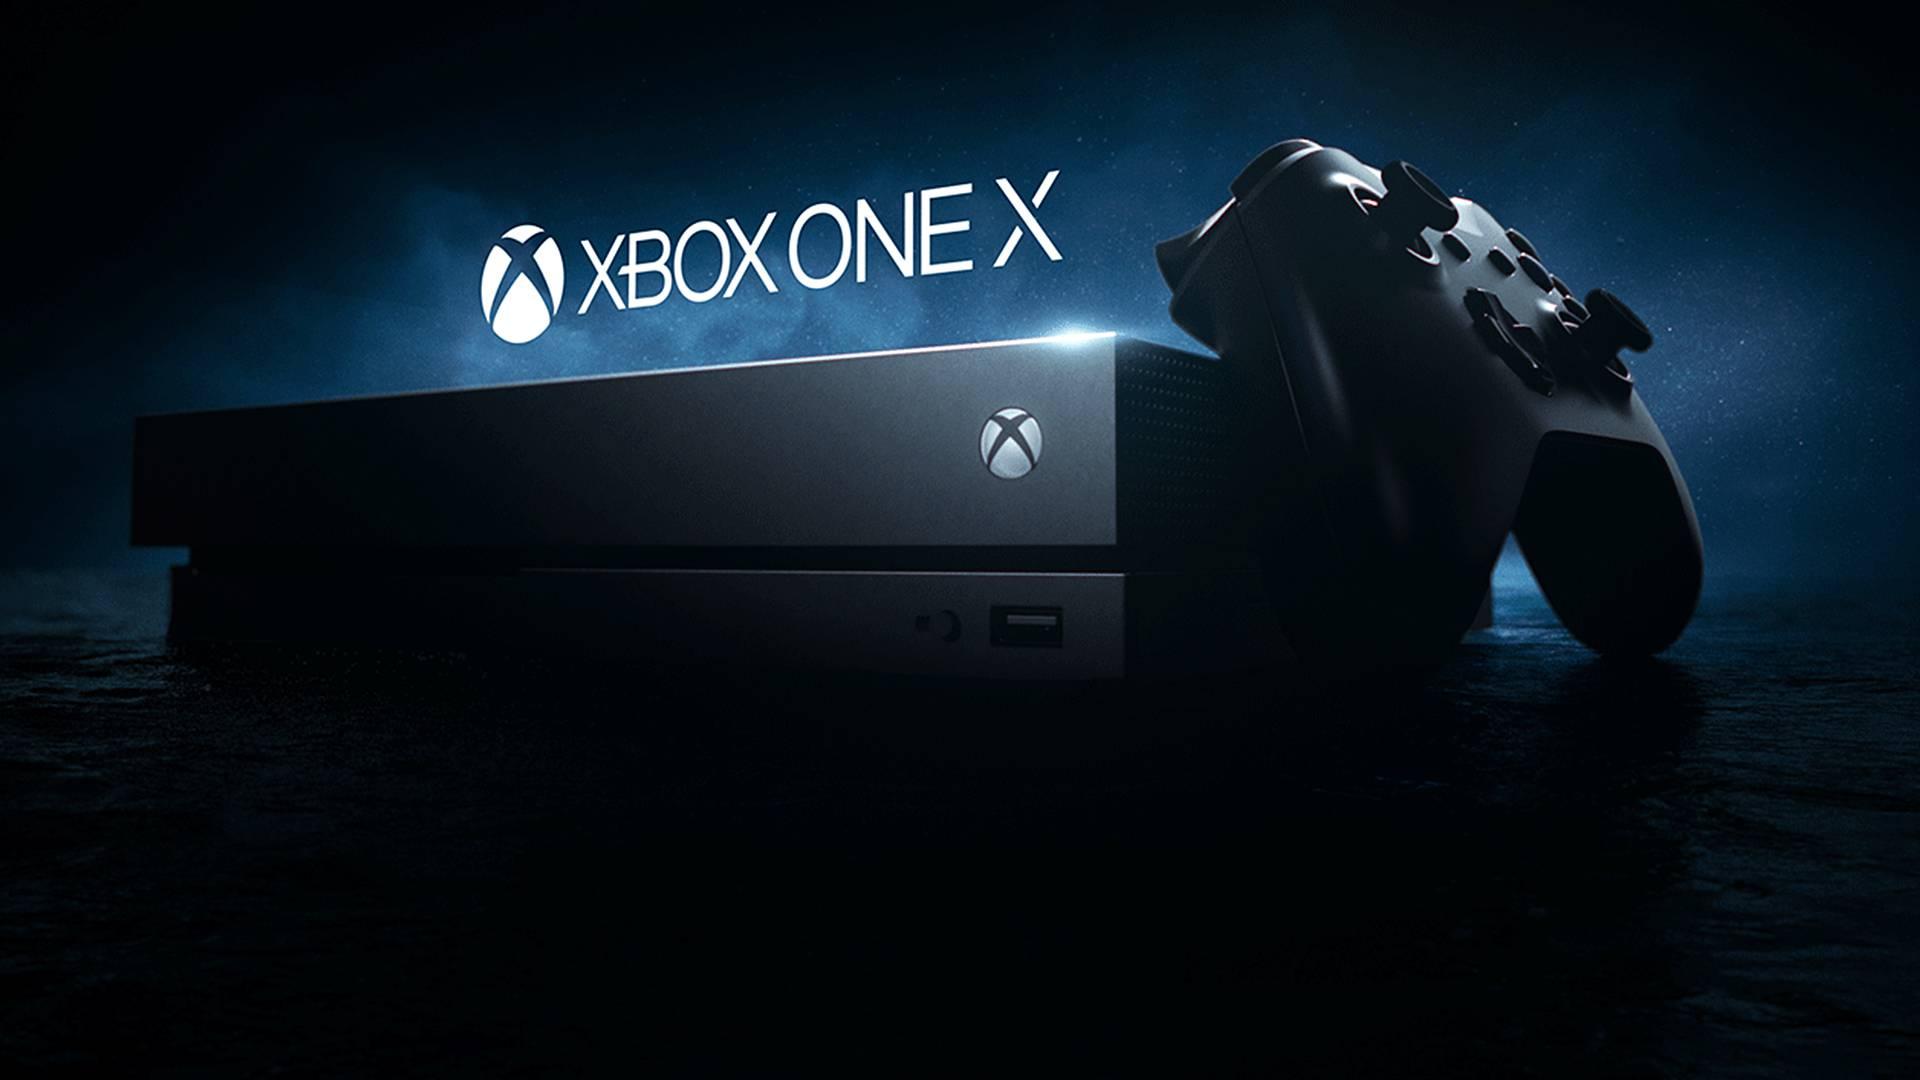 PS5 confirmed από τη Sony! (περίπου) – Geekdom News